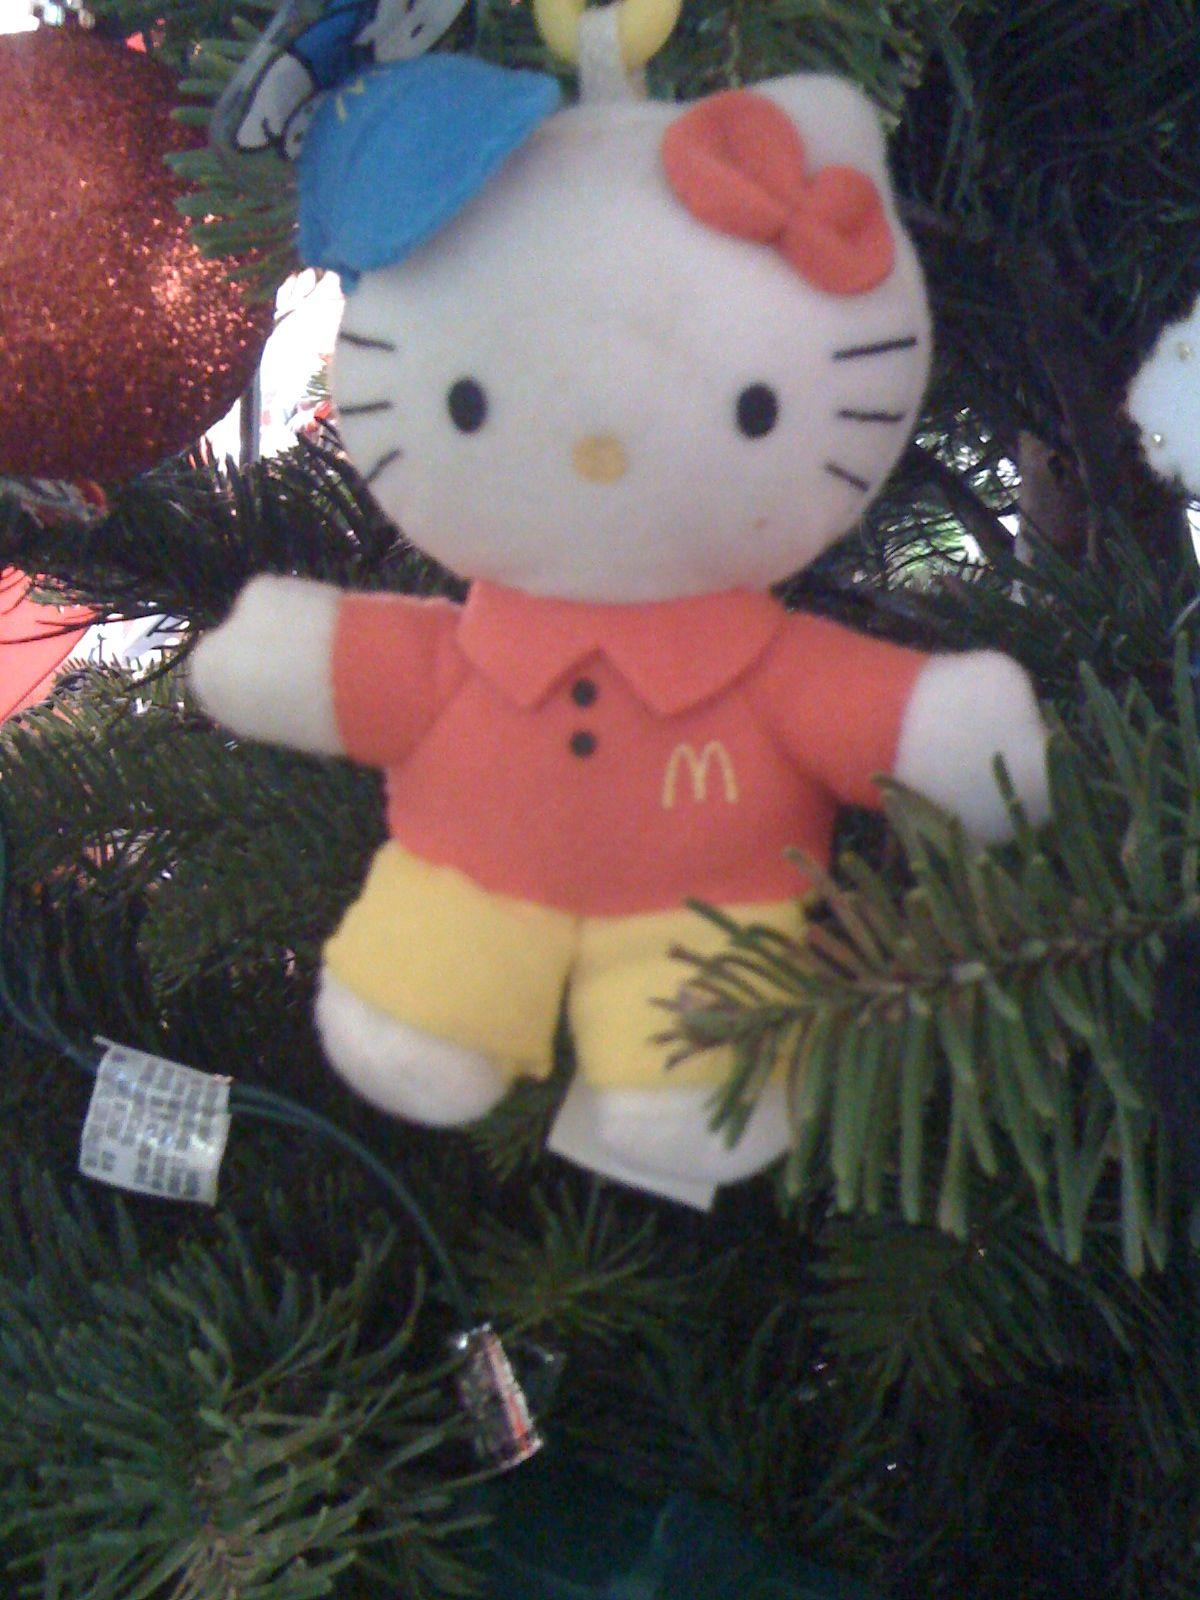 Mcdonalds Christmas ornaments, Hello kitty